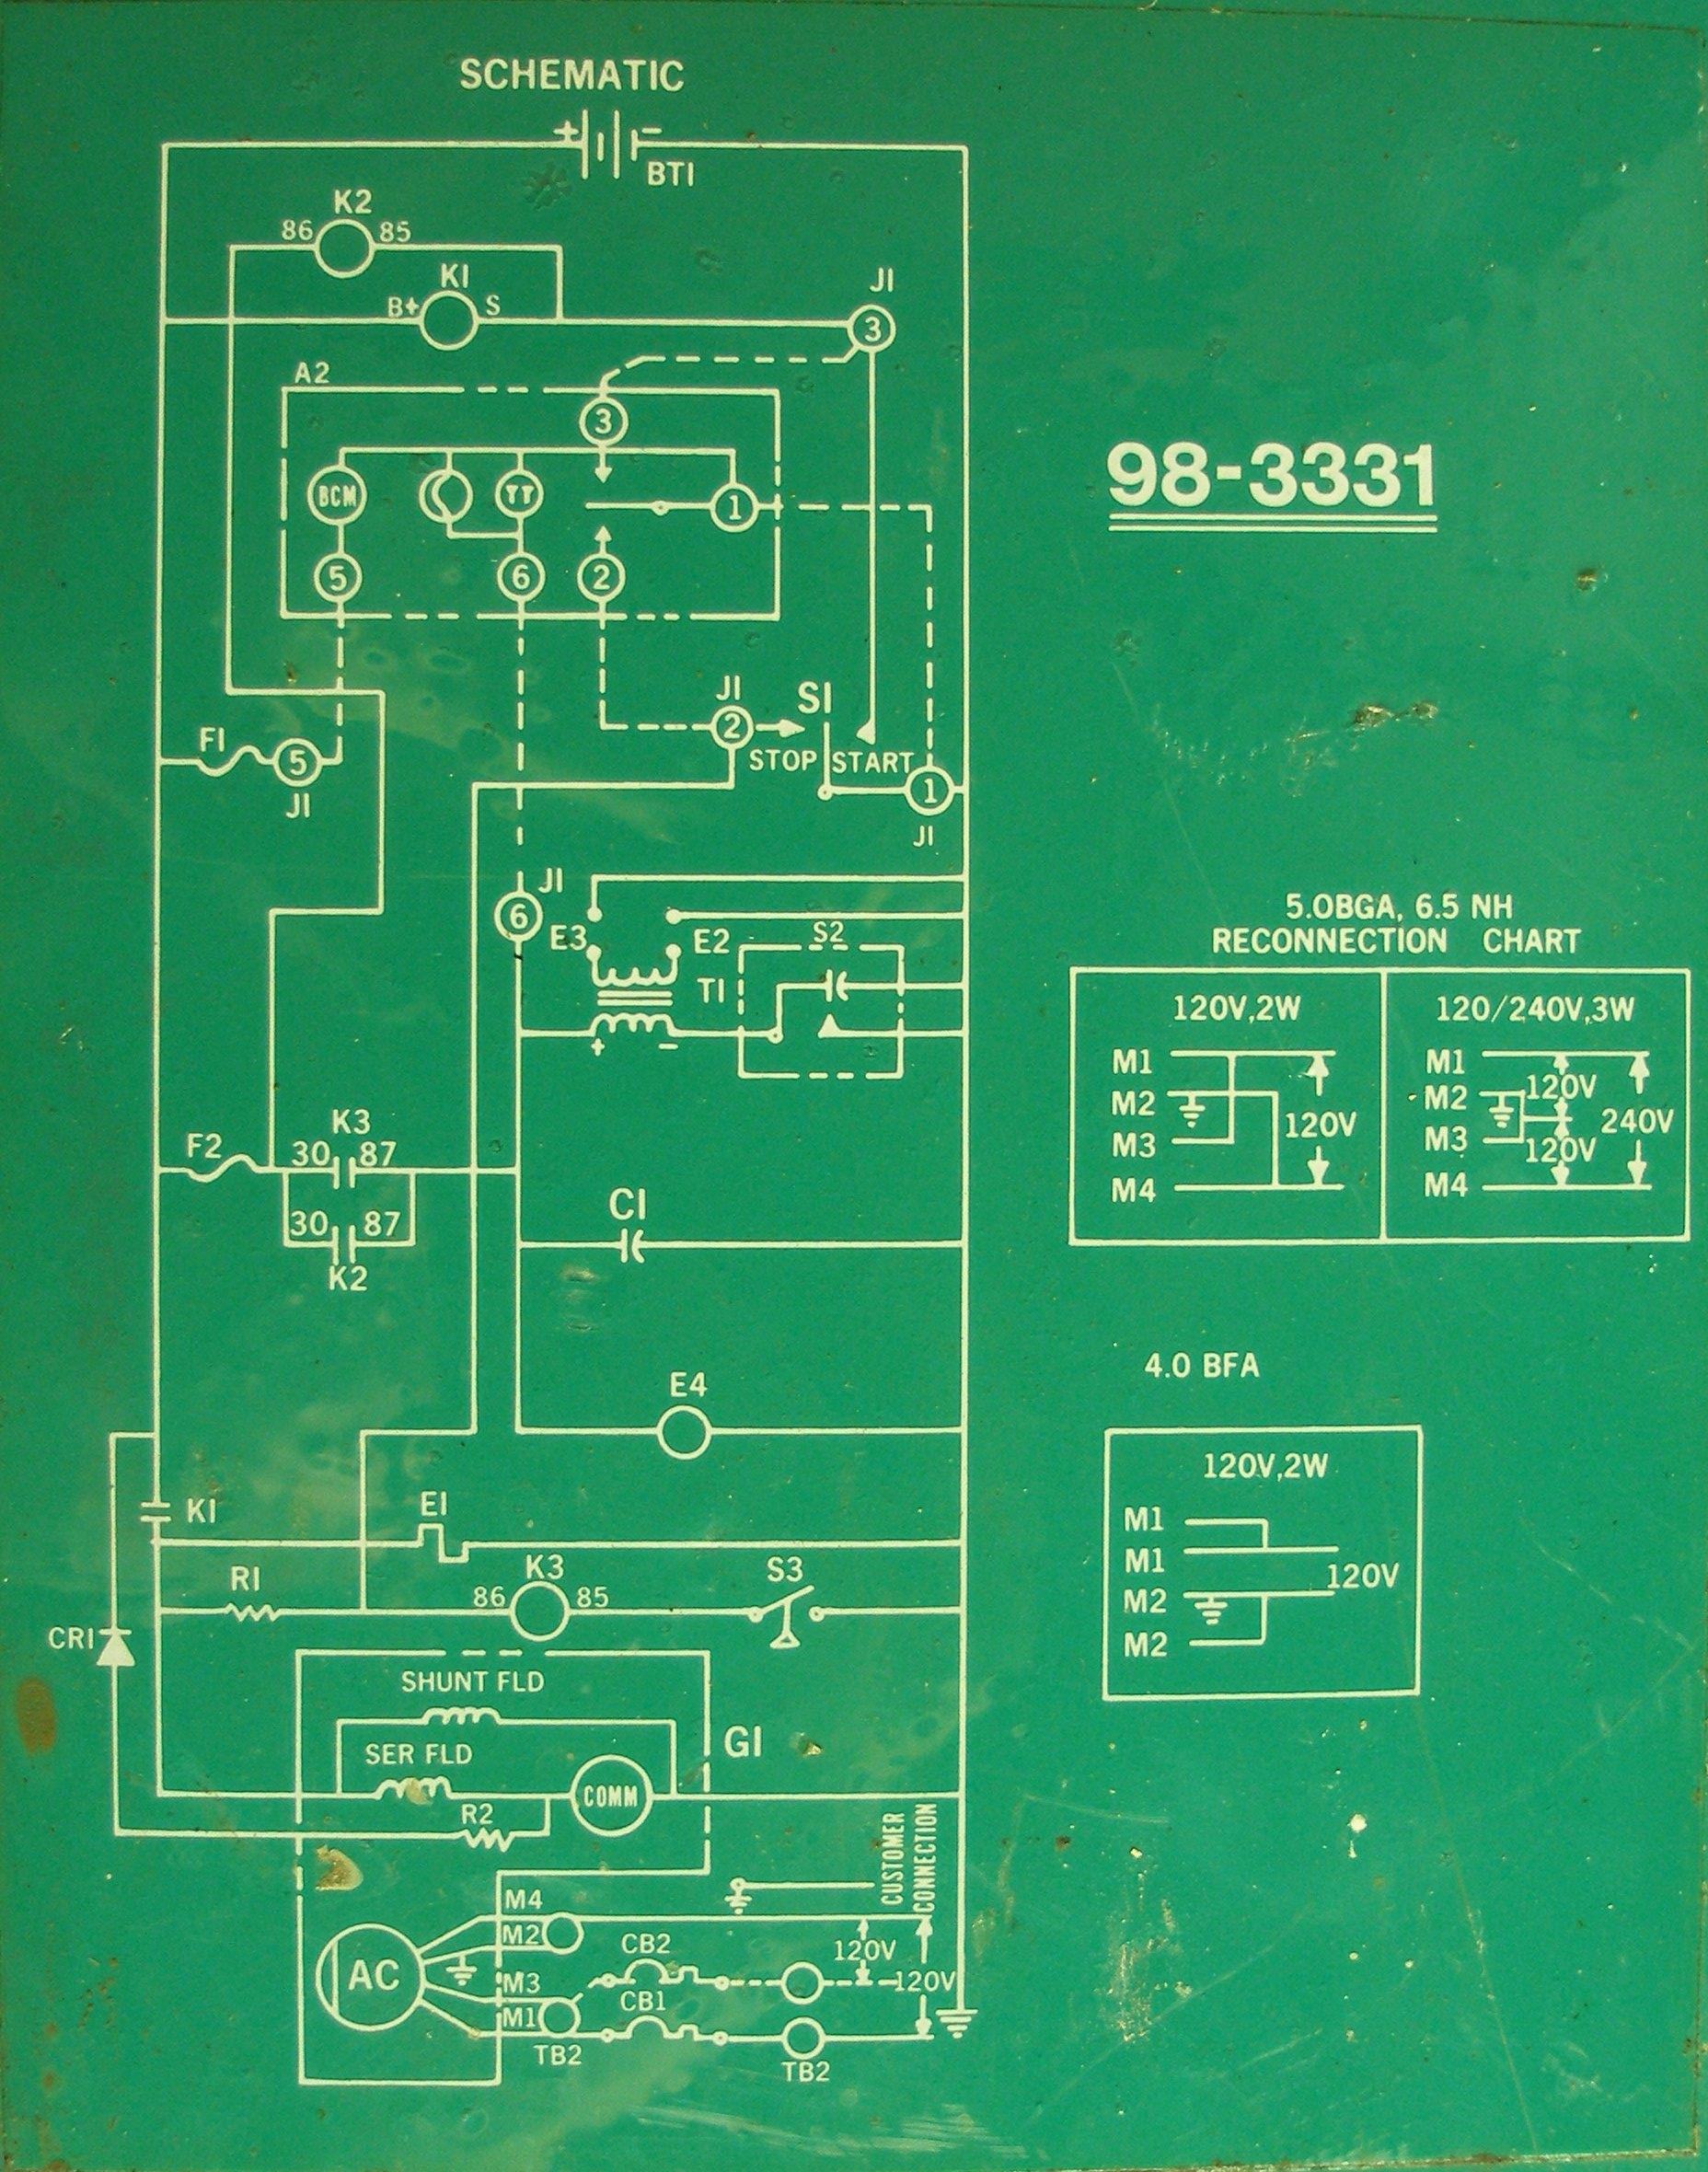 onan 4000 generator emerald 1 wiring diagram delco am radio wiring Onan Charging System Diagram  Onan Generator Engine Diagram Sears Wiring Diagram Detroit Wiring Diagram